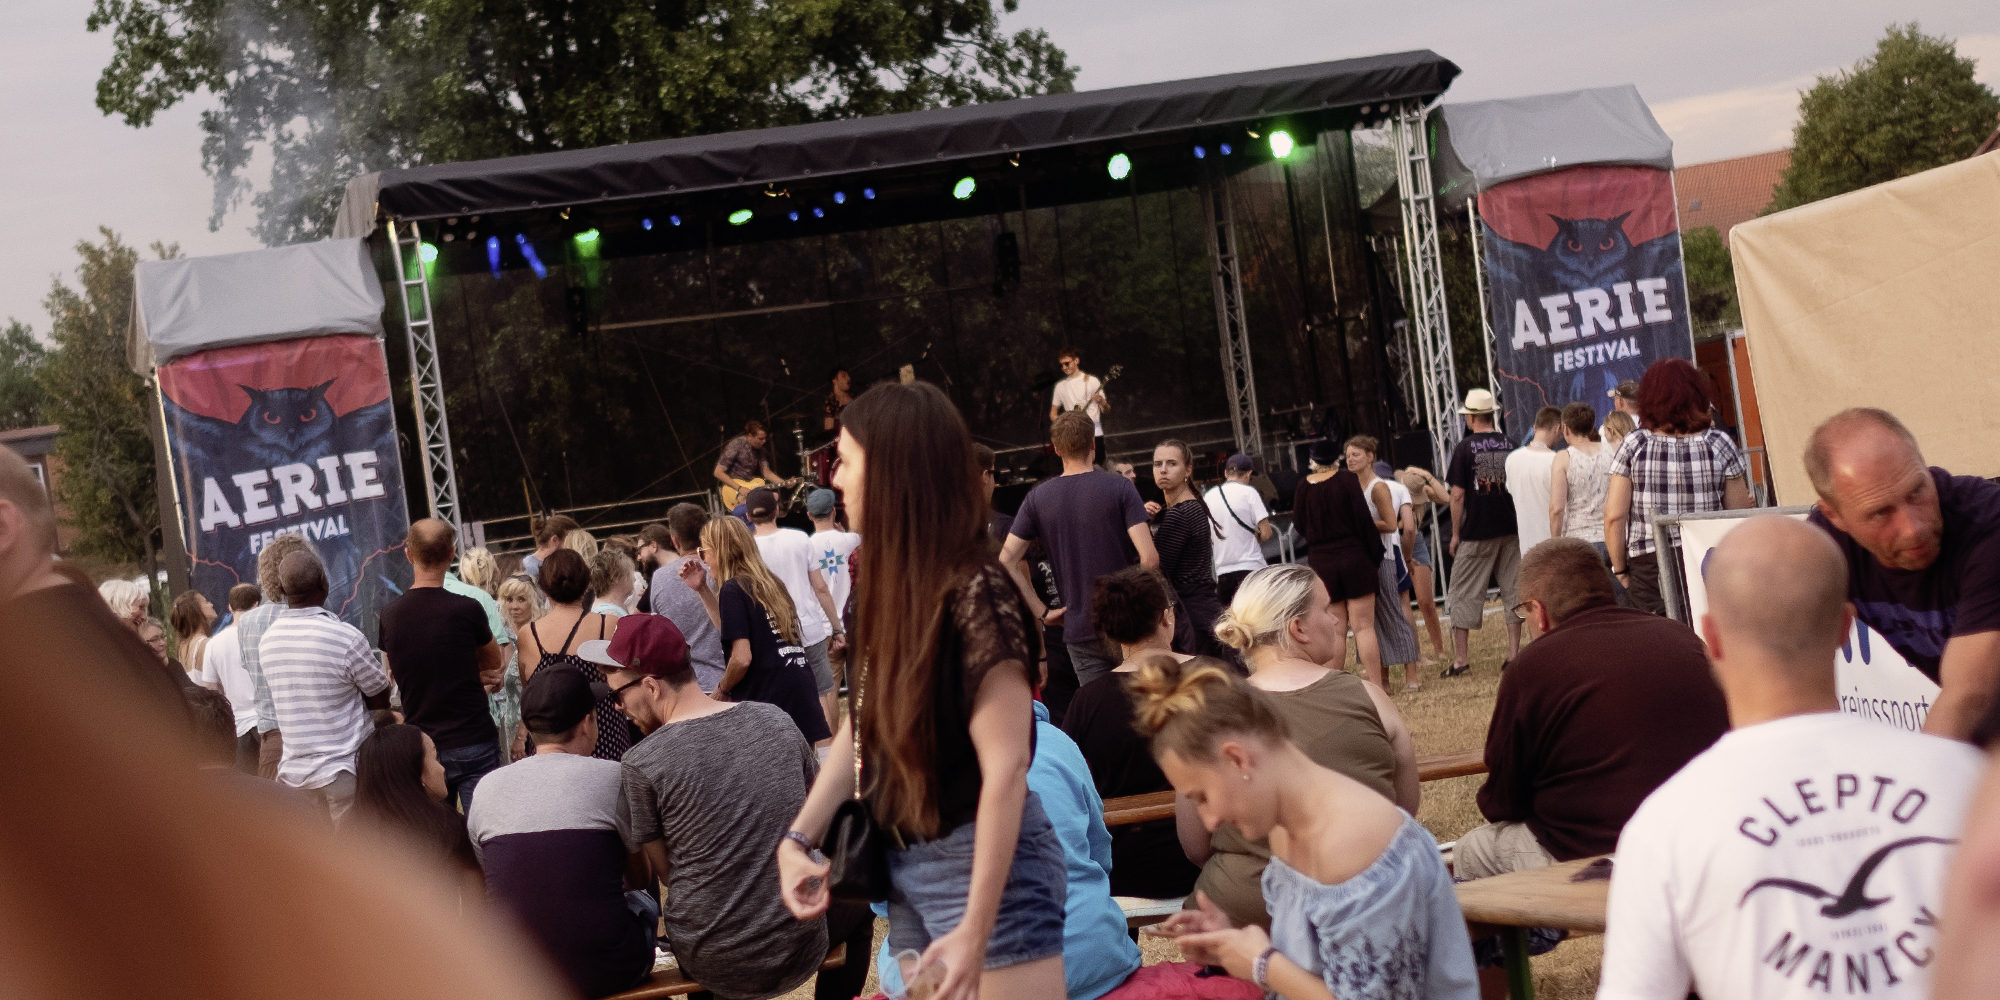 Aerie Festival Musik Feiern Und Gute Laune In Querenhorst